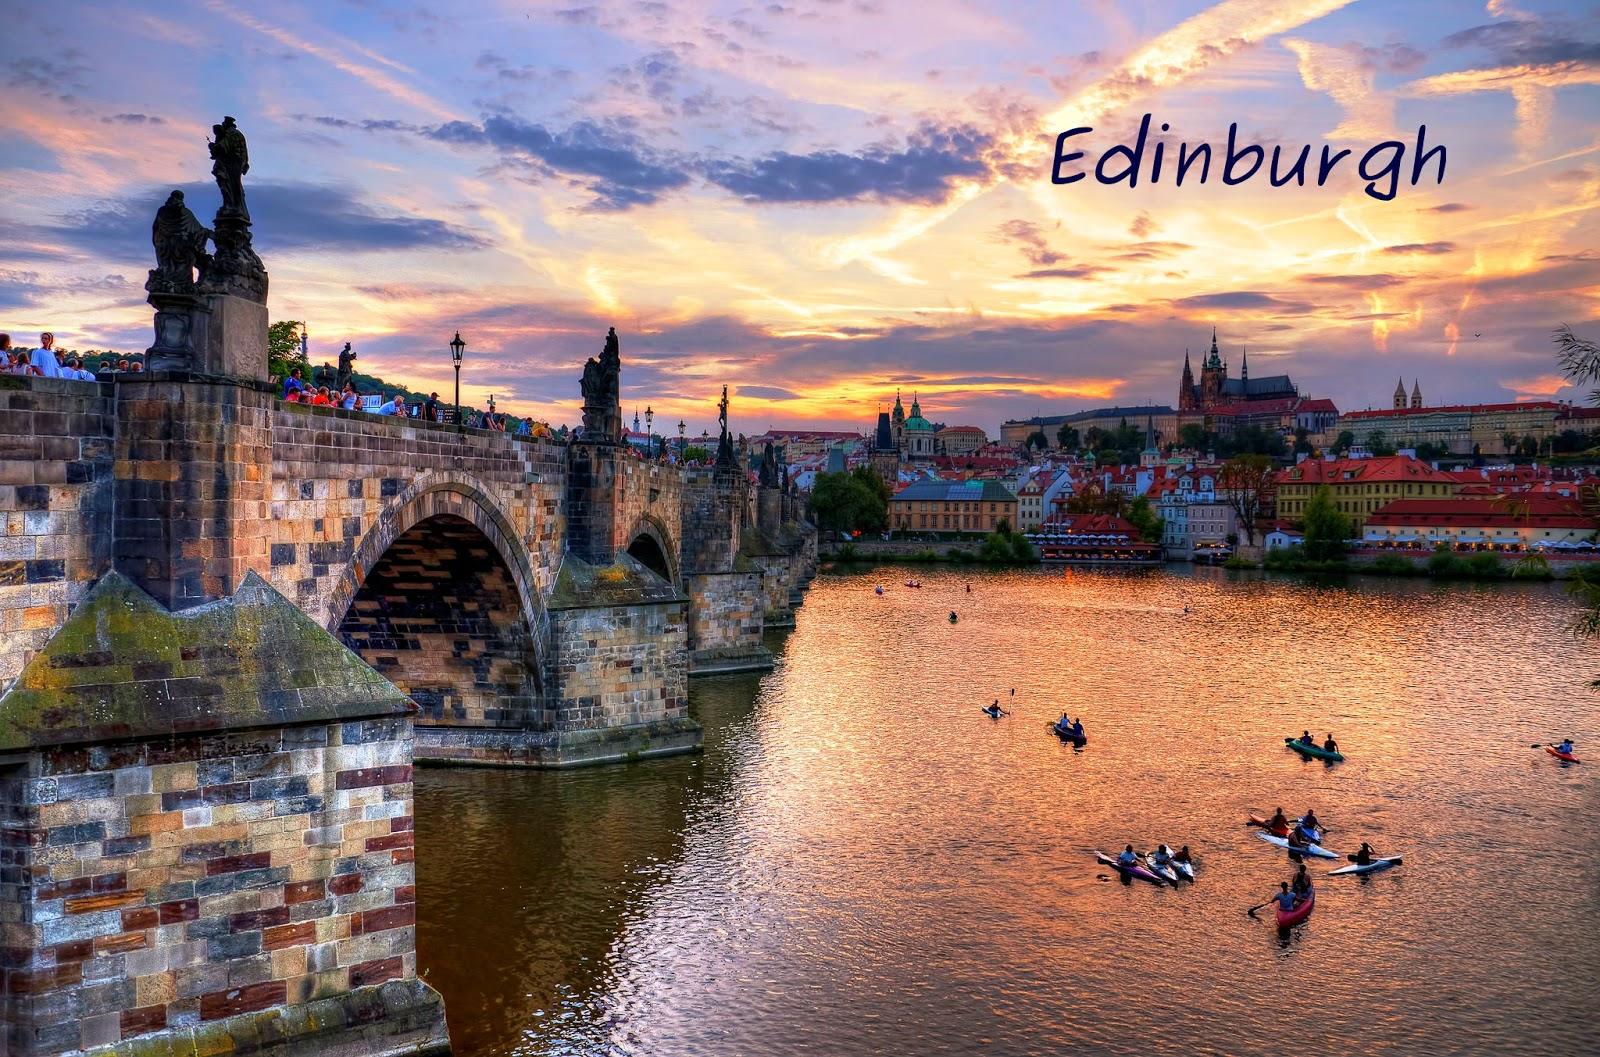 http://www.compareandfly.com/cheap-flights/flights-to-edinburgh/a-edi